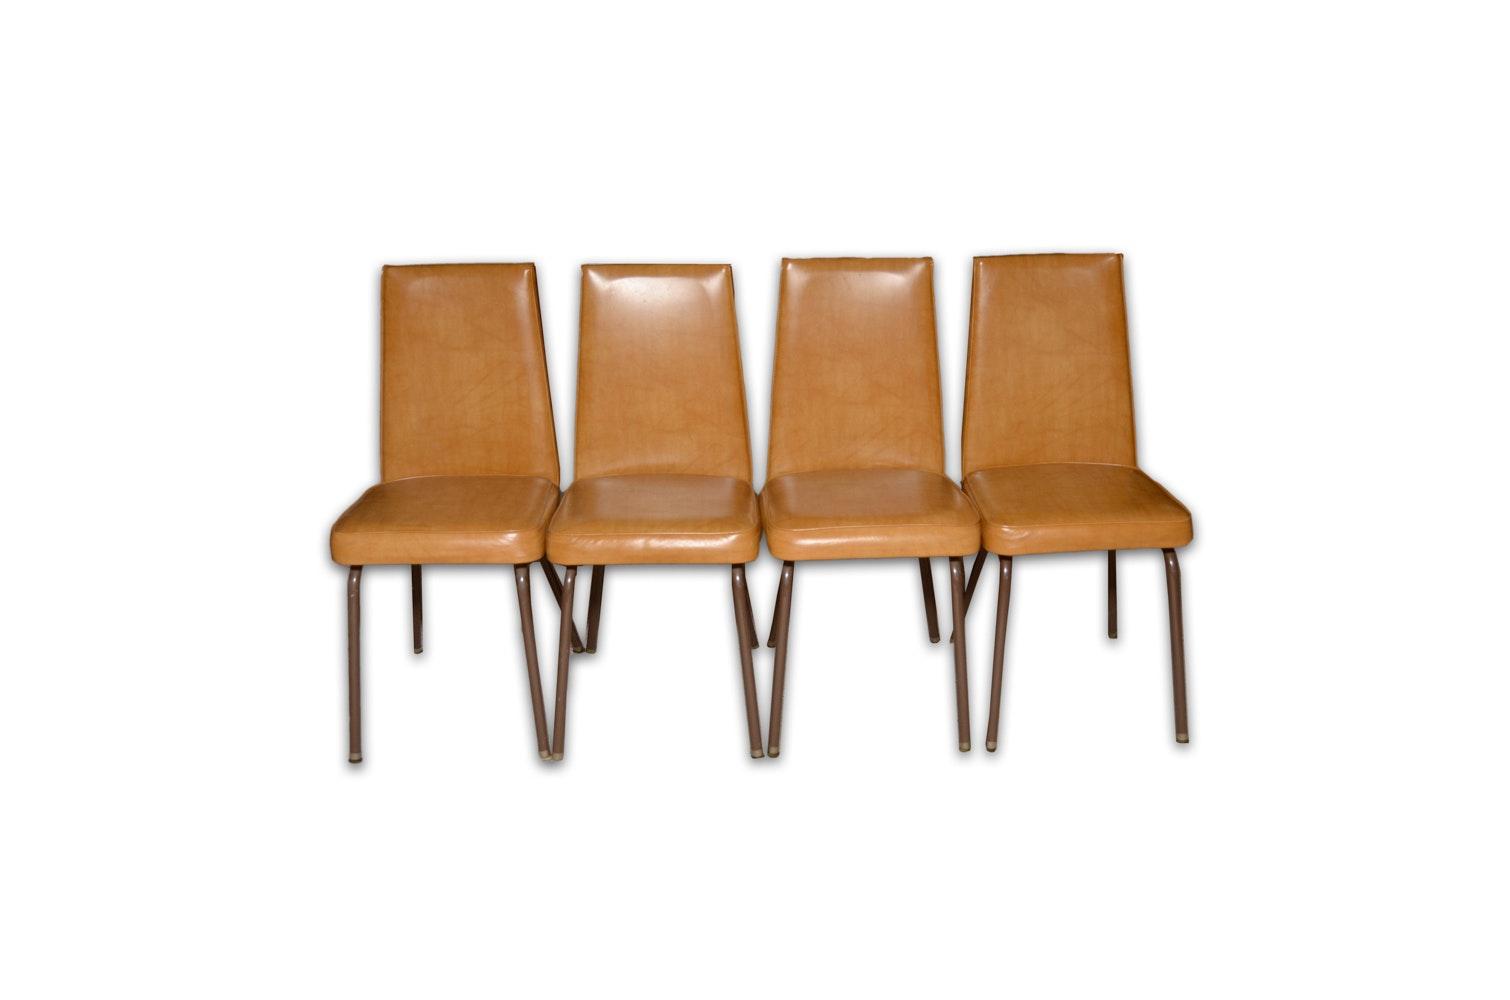 Stoneville Furniture Bar Stools Furniture Designs